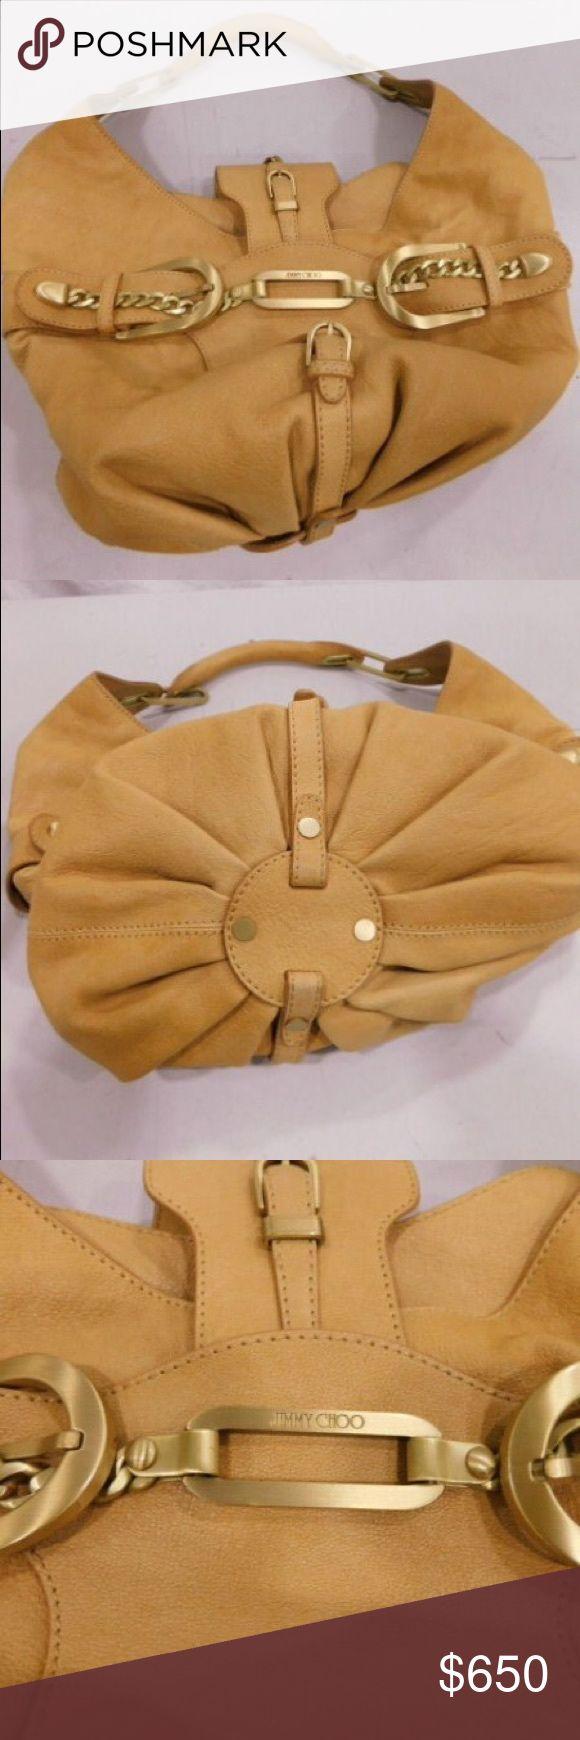 Jimmy Choo Tan Leather Hobo Shoulder Bag Jimmy Choo tan leather hobo shoulder bag. Authentic.    Dimensions: 11.5'' 9'' 12  EUC Very clean.  Free shipping. Jimmy Choo Bags Shoulder Bags